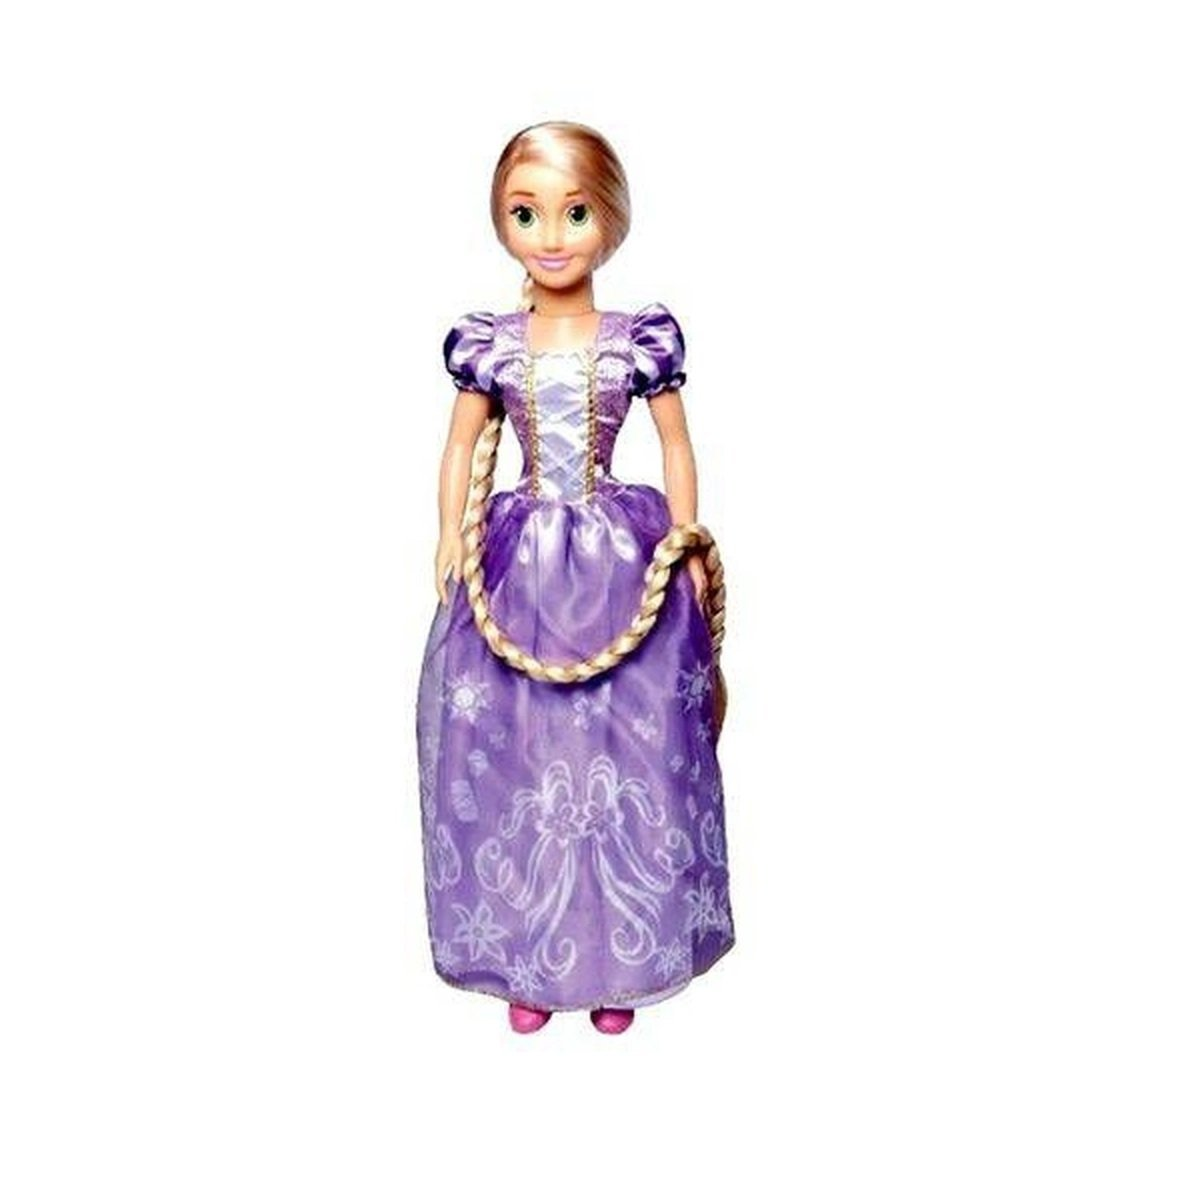 Boneca Princesa Disney Rapunzel - Baby Brink 2000